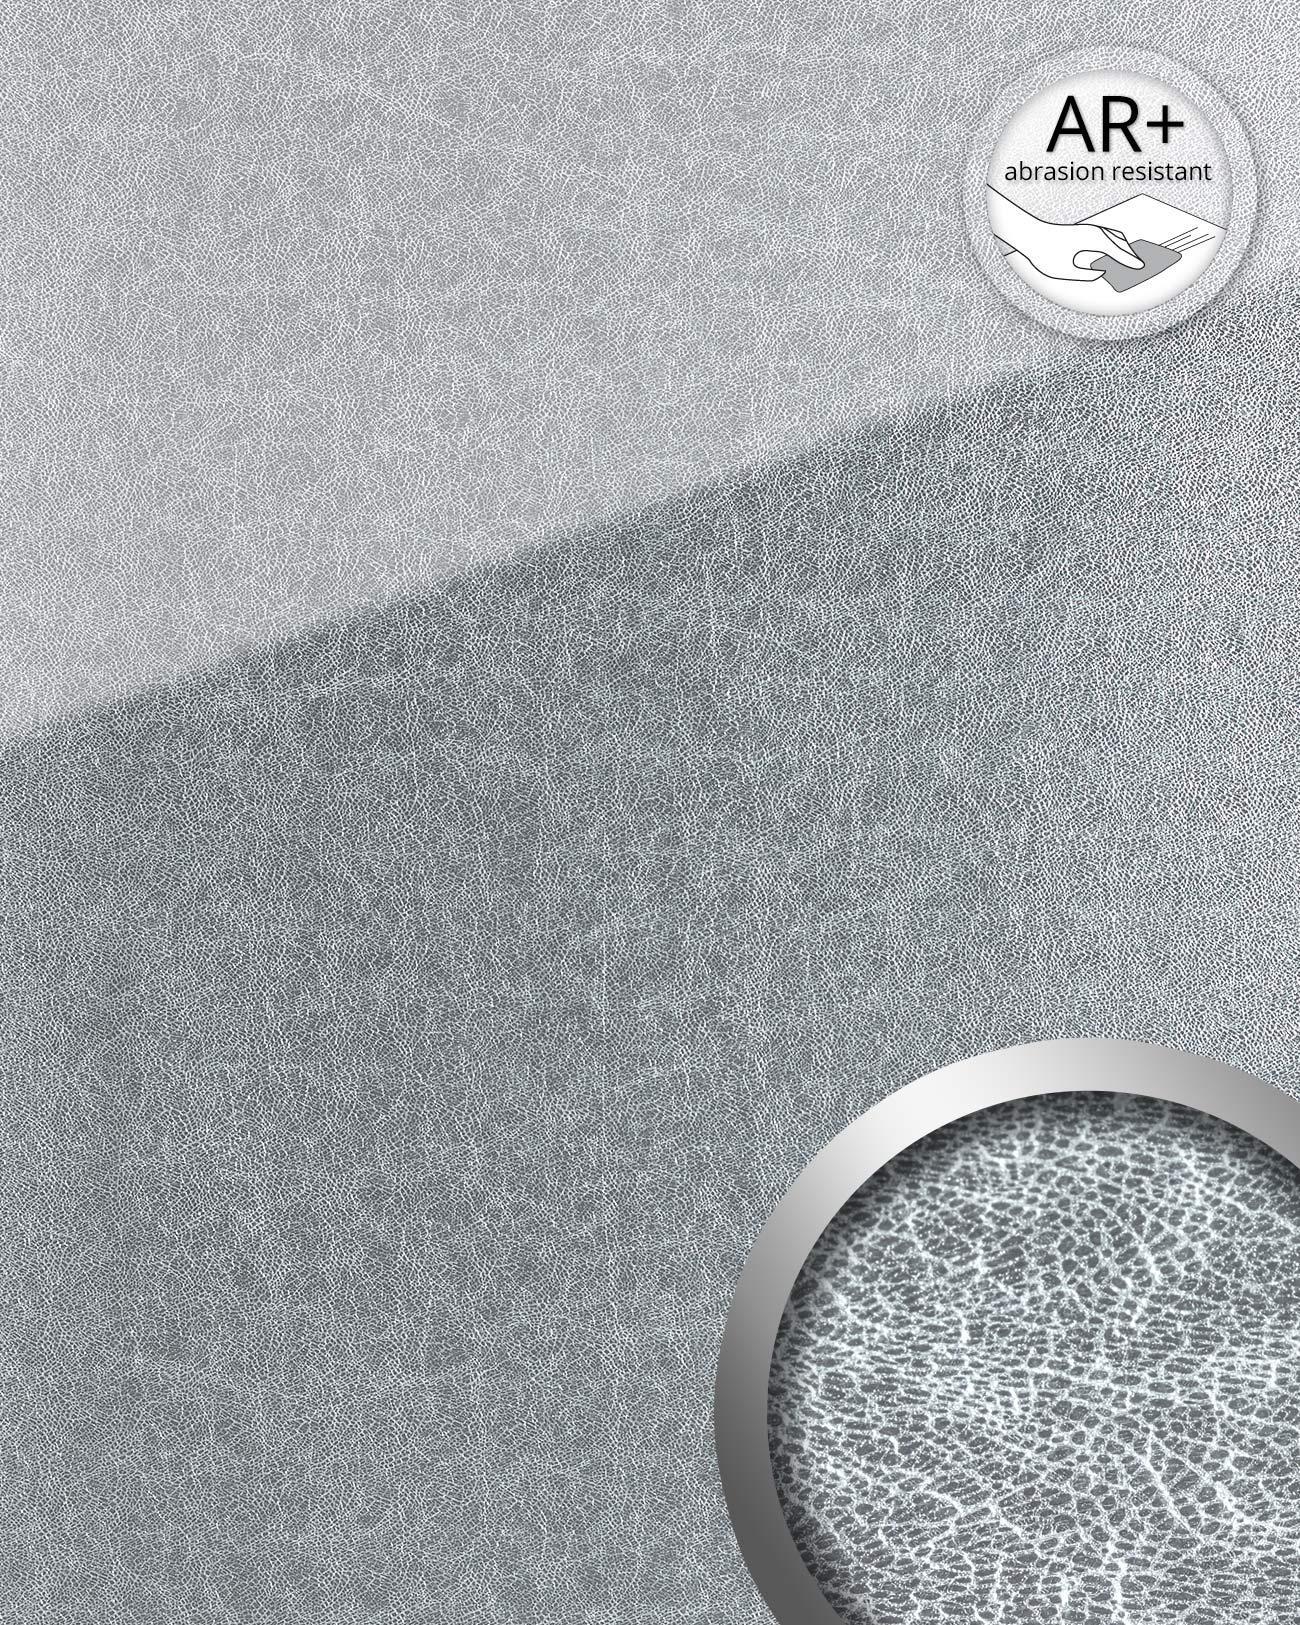 Wandpaneel GlasOptik WallFace SHATTERED Silver AR - Fliesen glasoptik